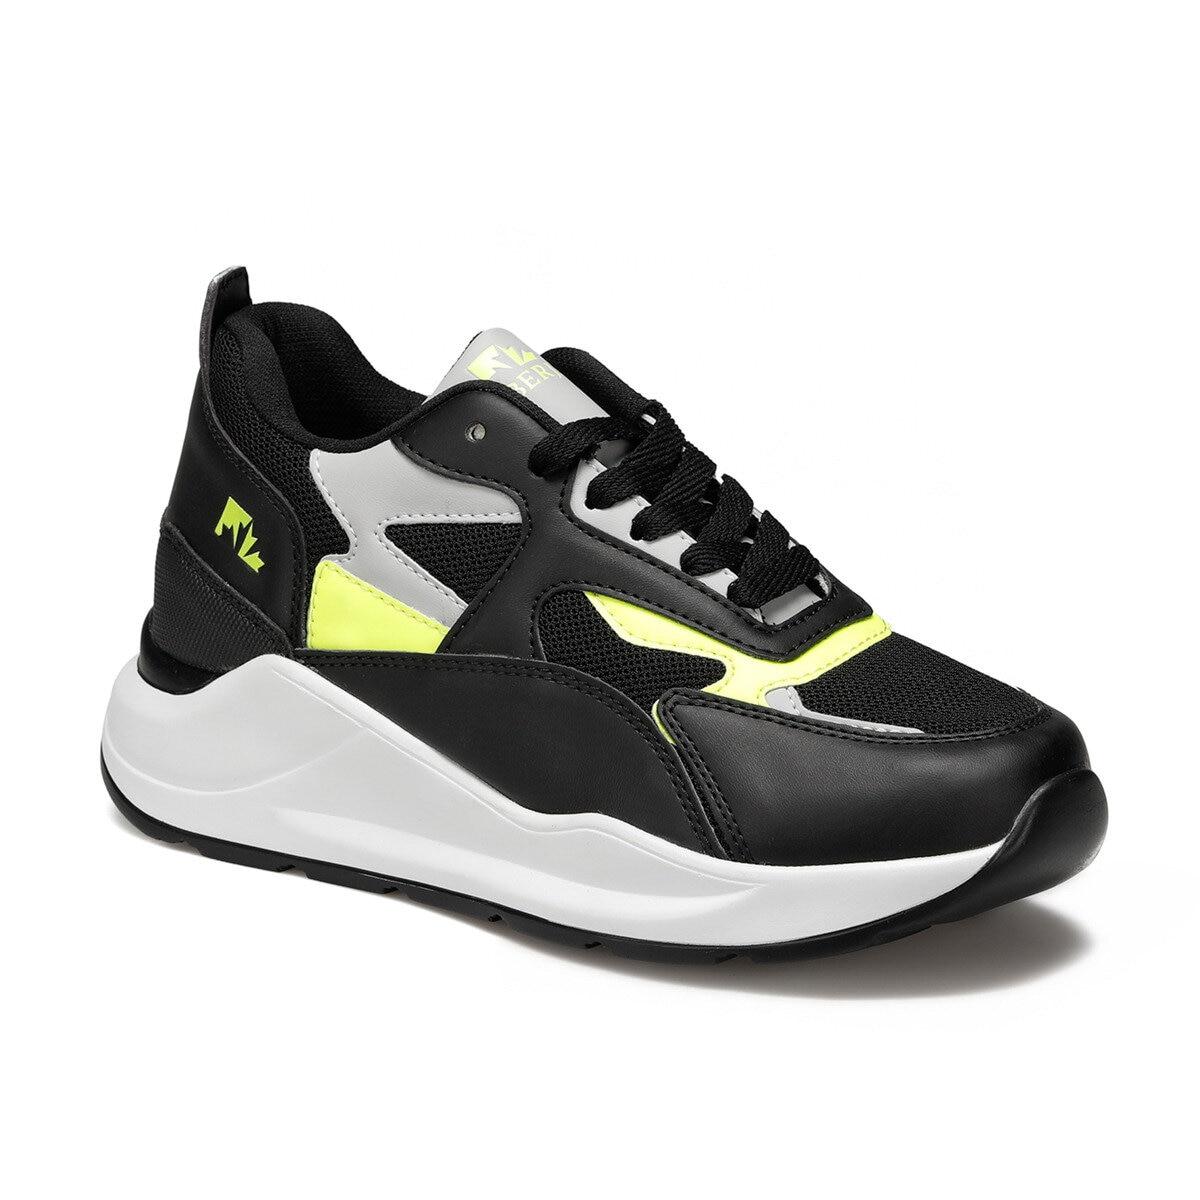 FLO Black Women Sneaker Shoes New Platform Ladies Sneakers Breathable Women Casual Shoes Woman Fashion Shoes LUMBERJACK NATALIE